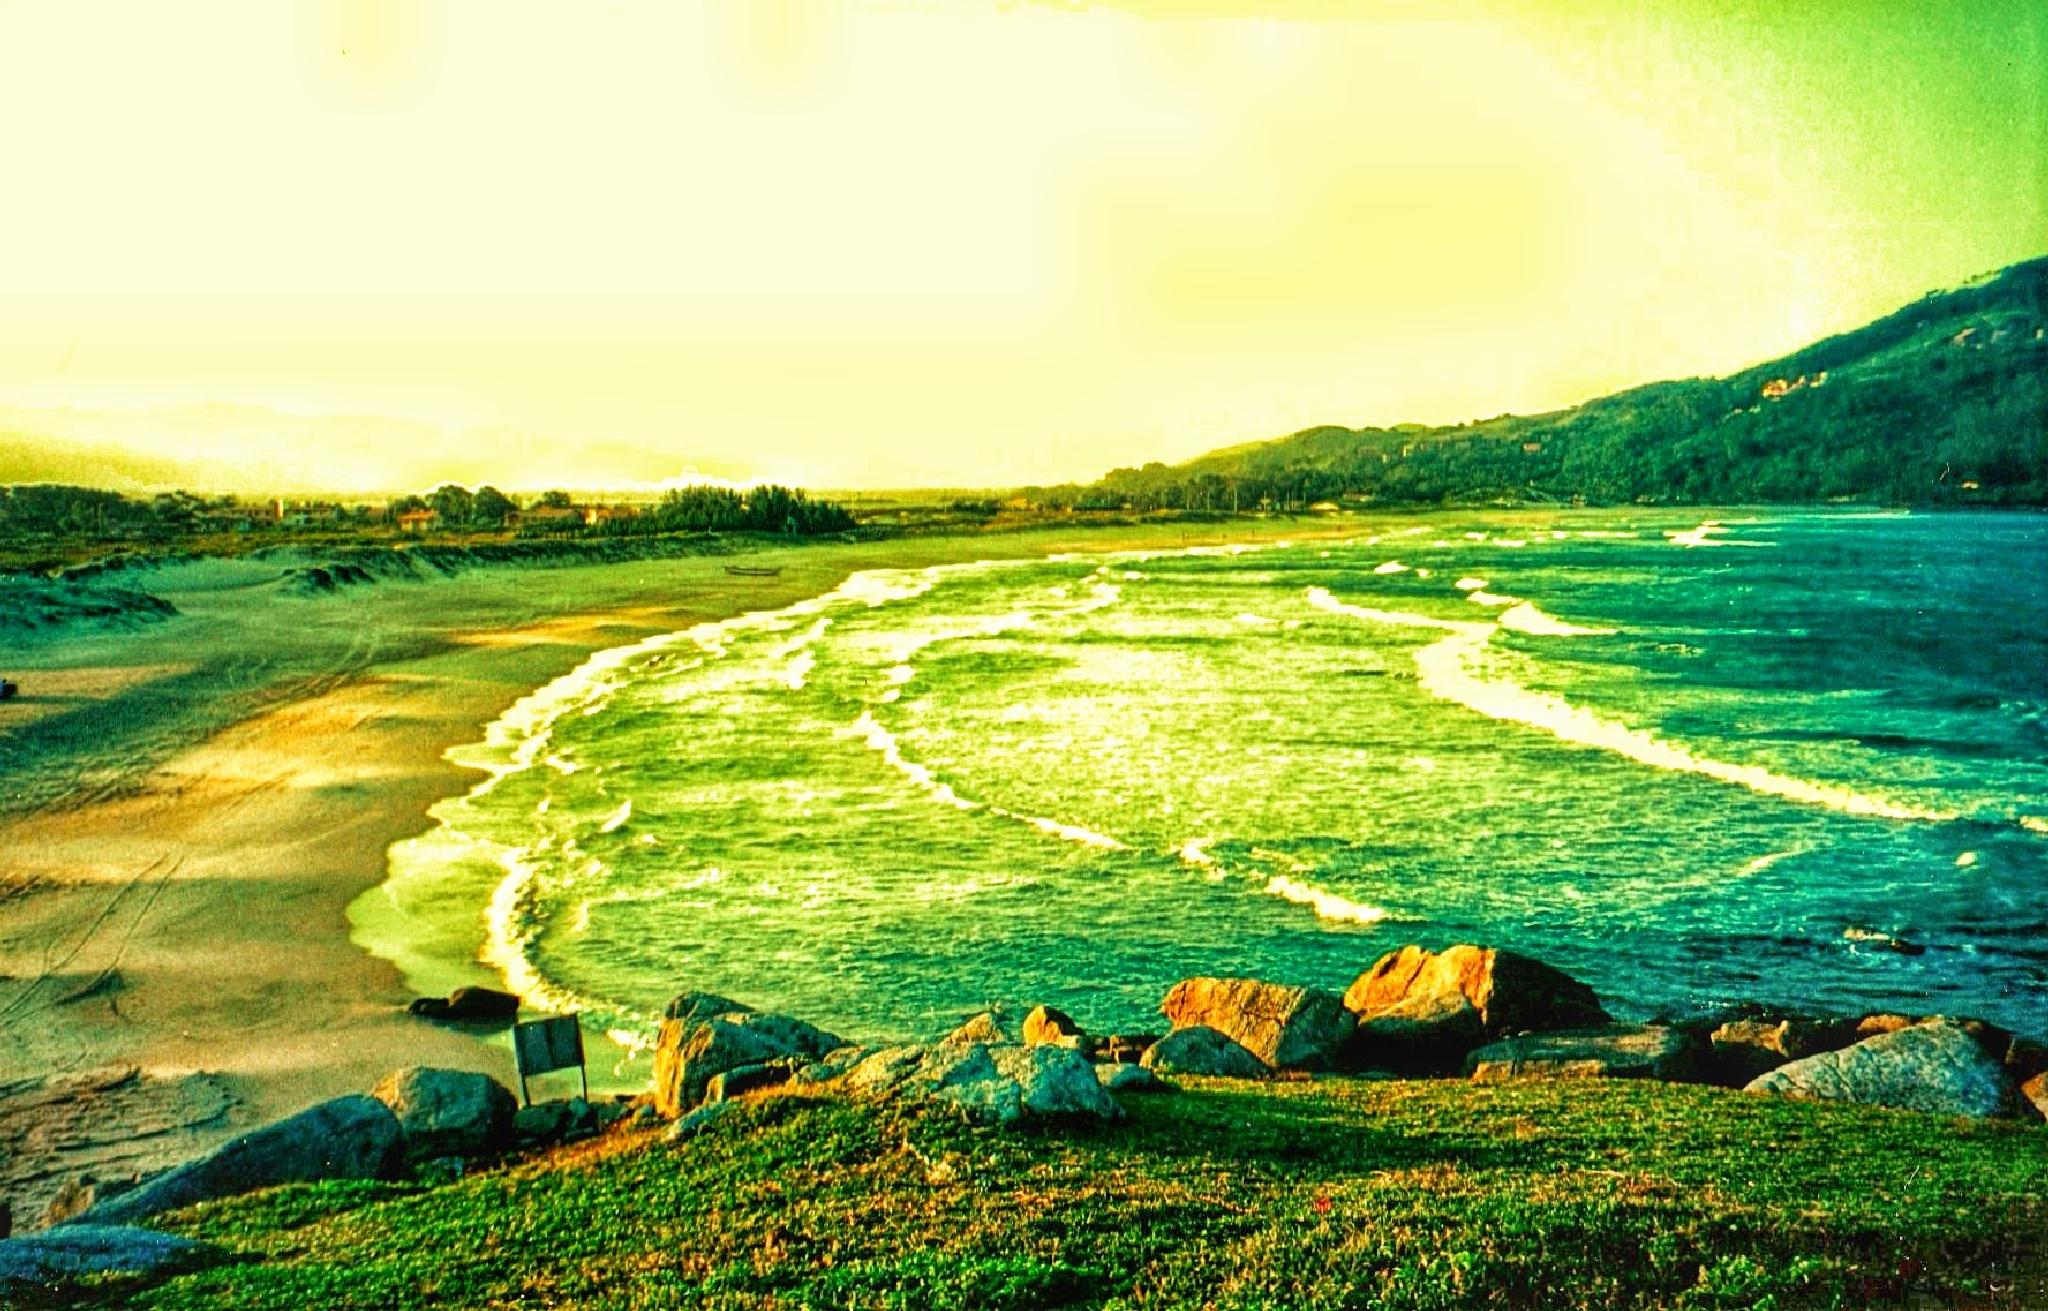 Chlorophyll ocean - Brazil by CopaCabana